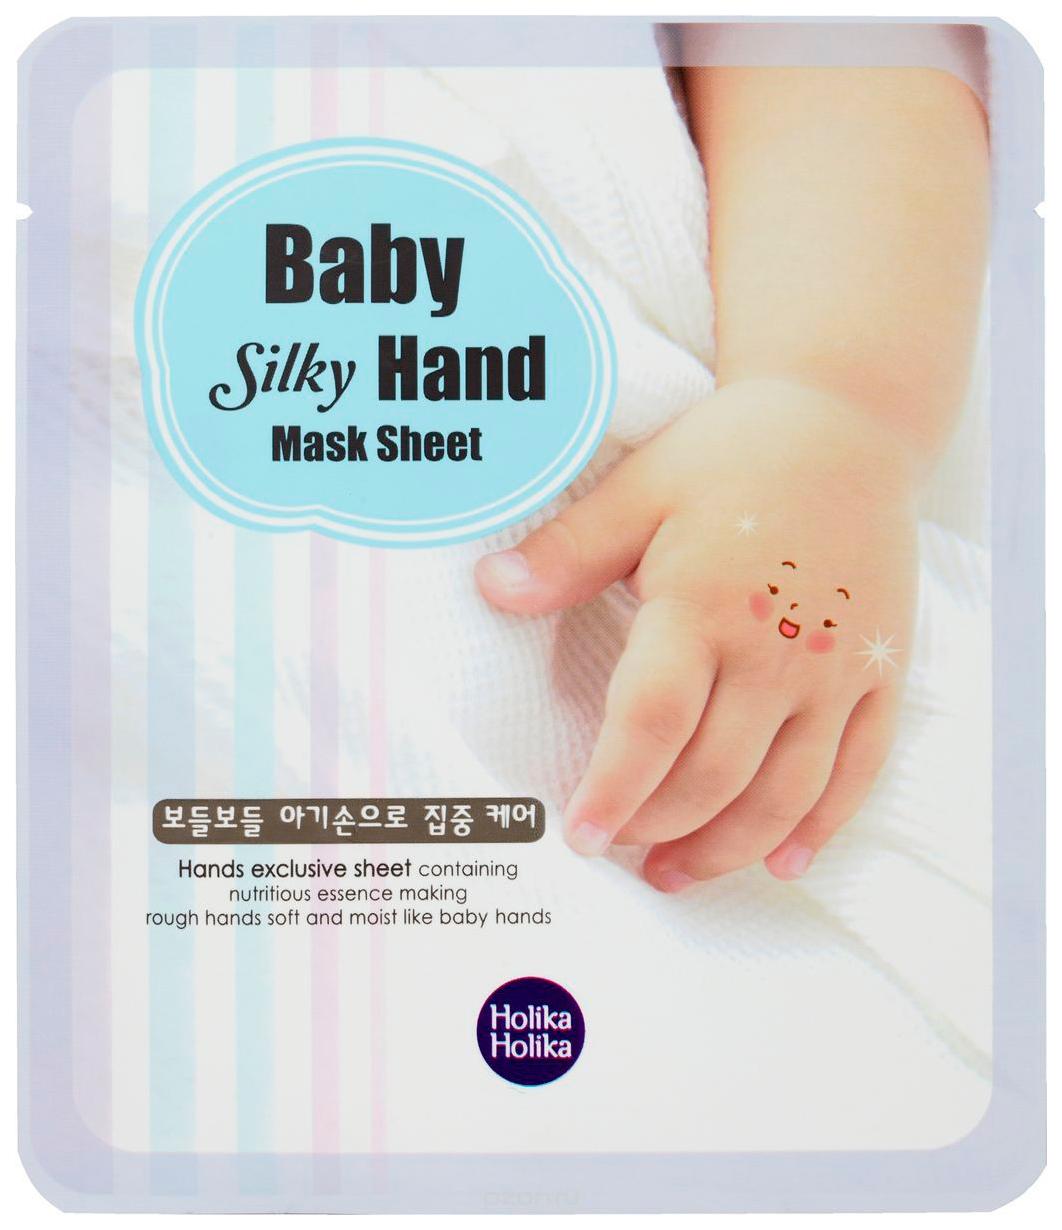 Маска для рук Holika Holika Baby Silky Hand Mask Sheet 18 мл